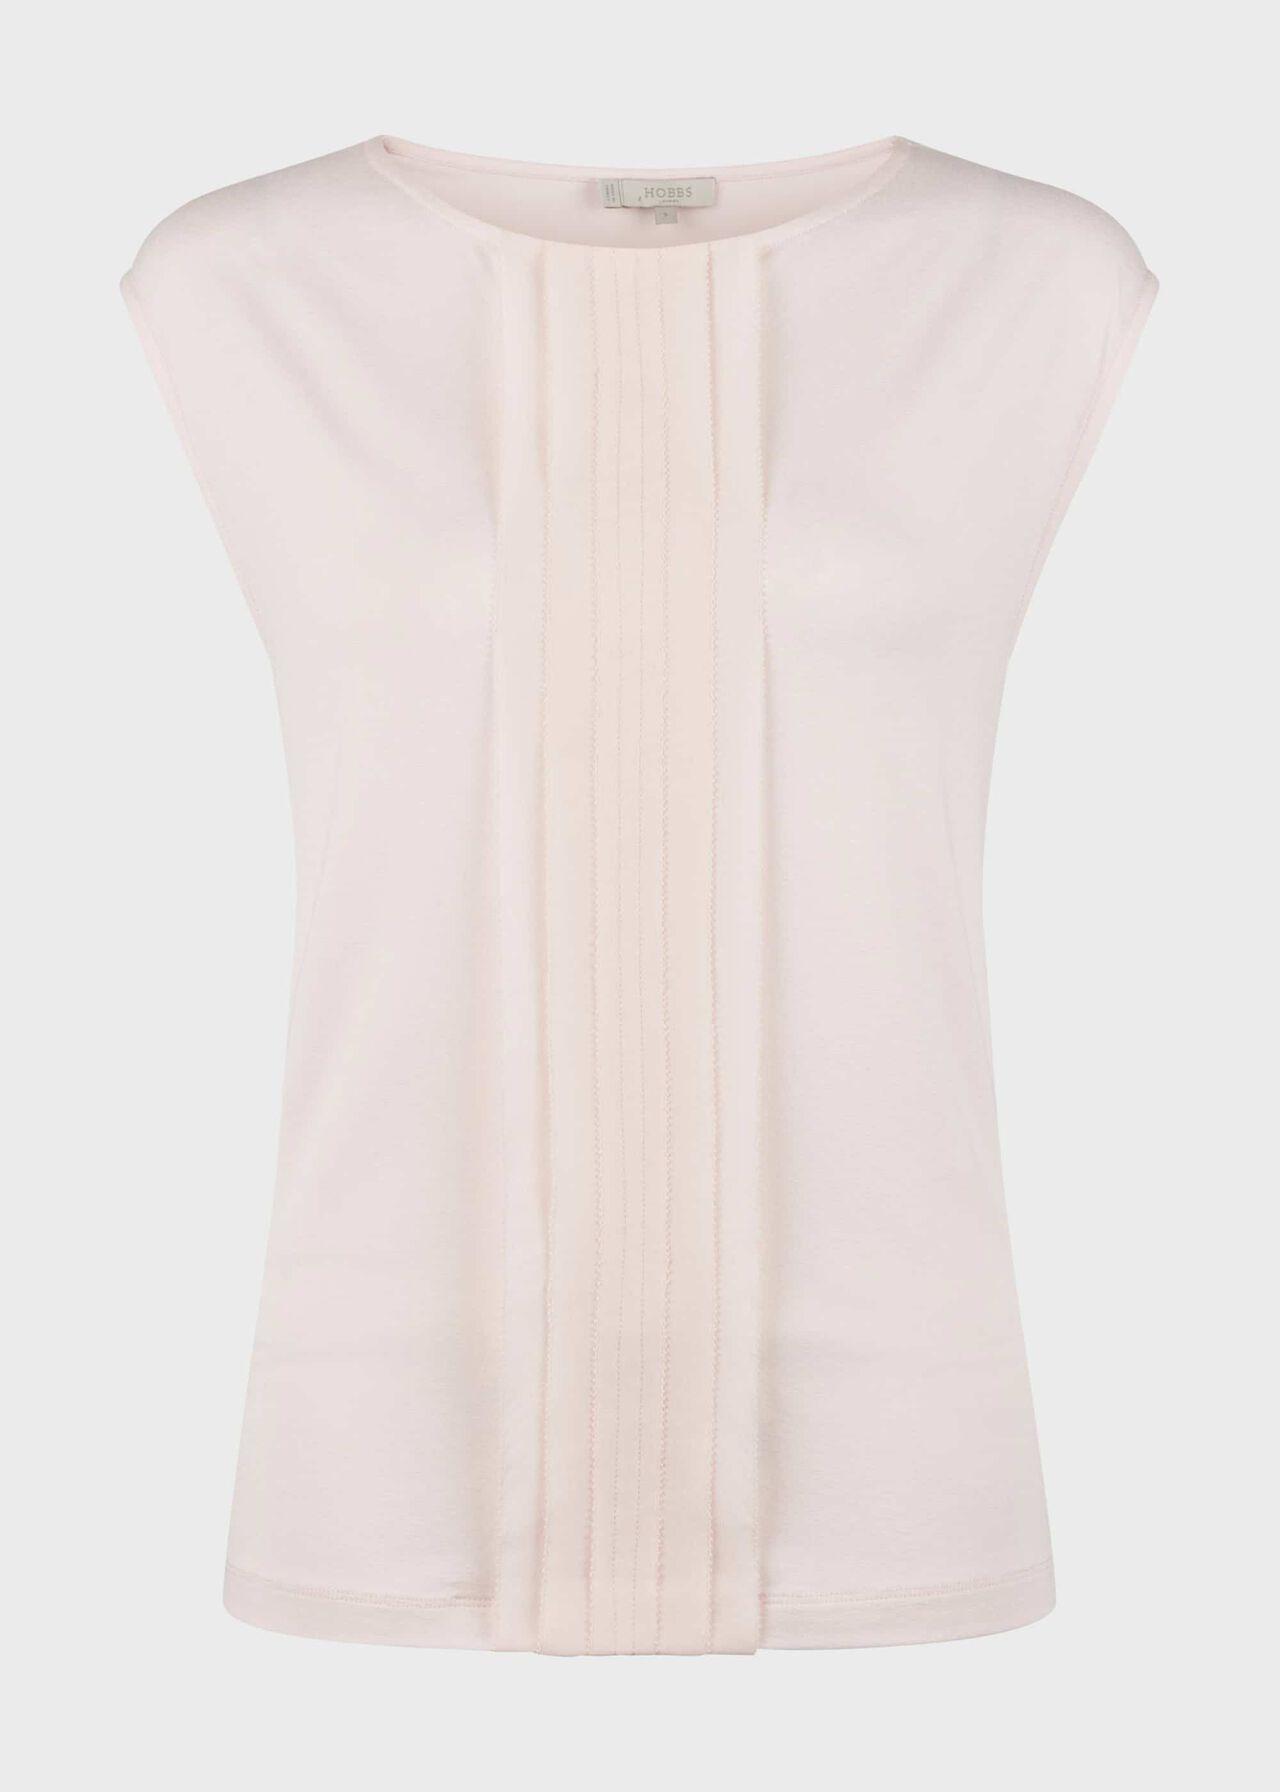 Urma Jersey Top Pale Pink